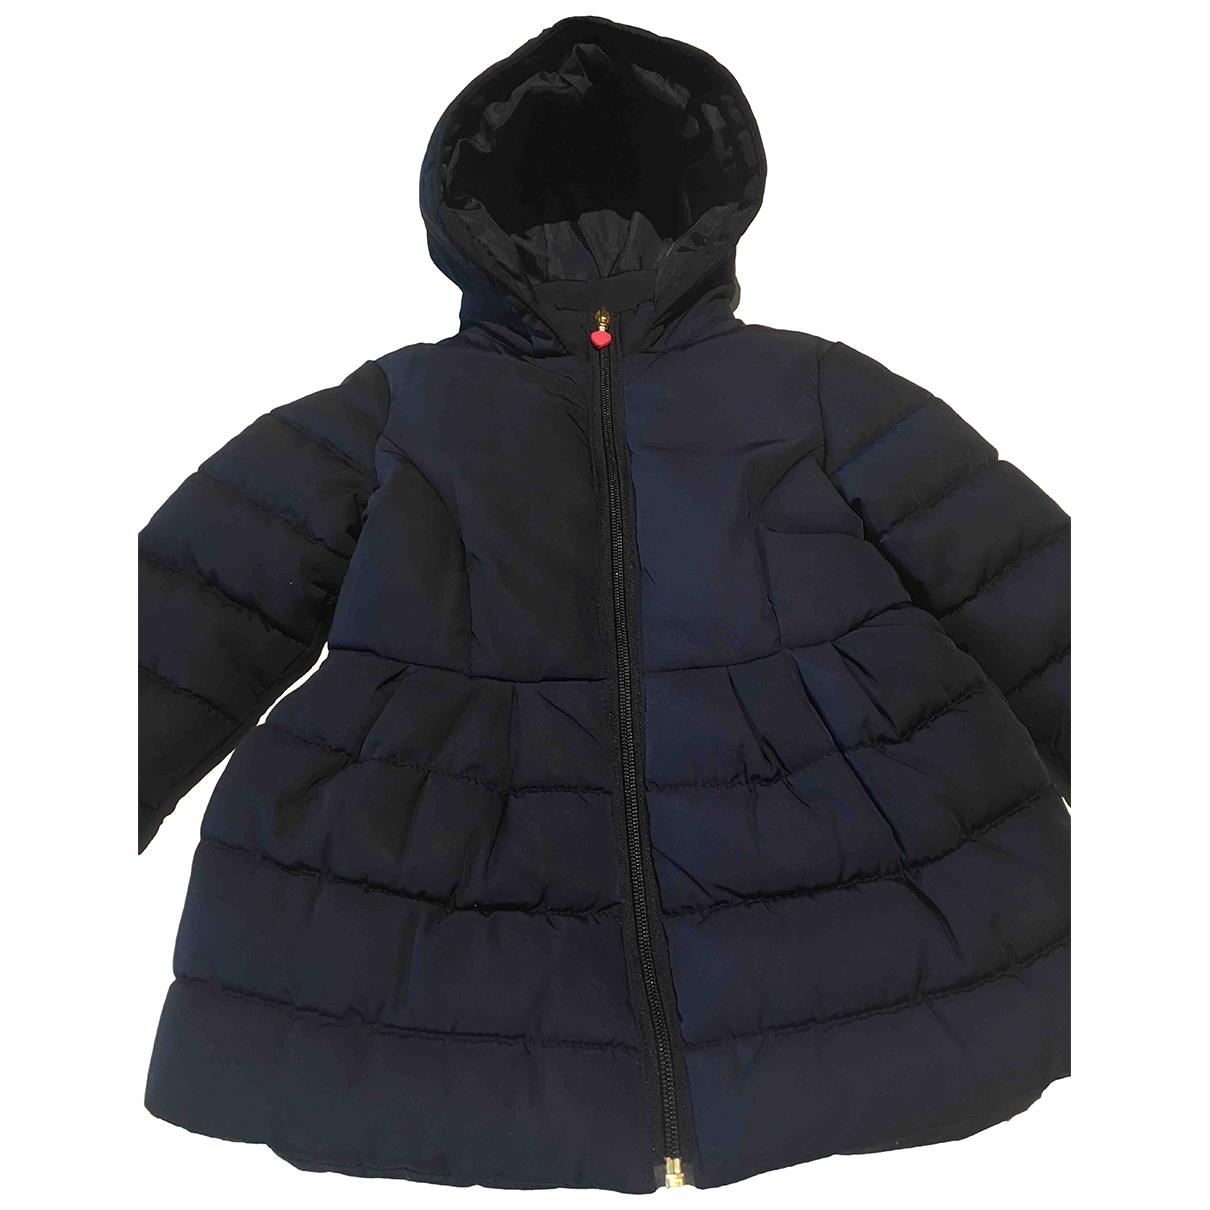 Billieblush \N Blue jacket & coat for Kids 2 years - up to 86cm FR